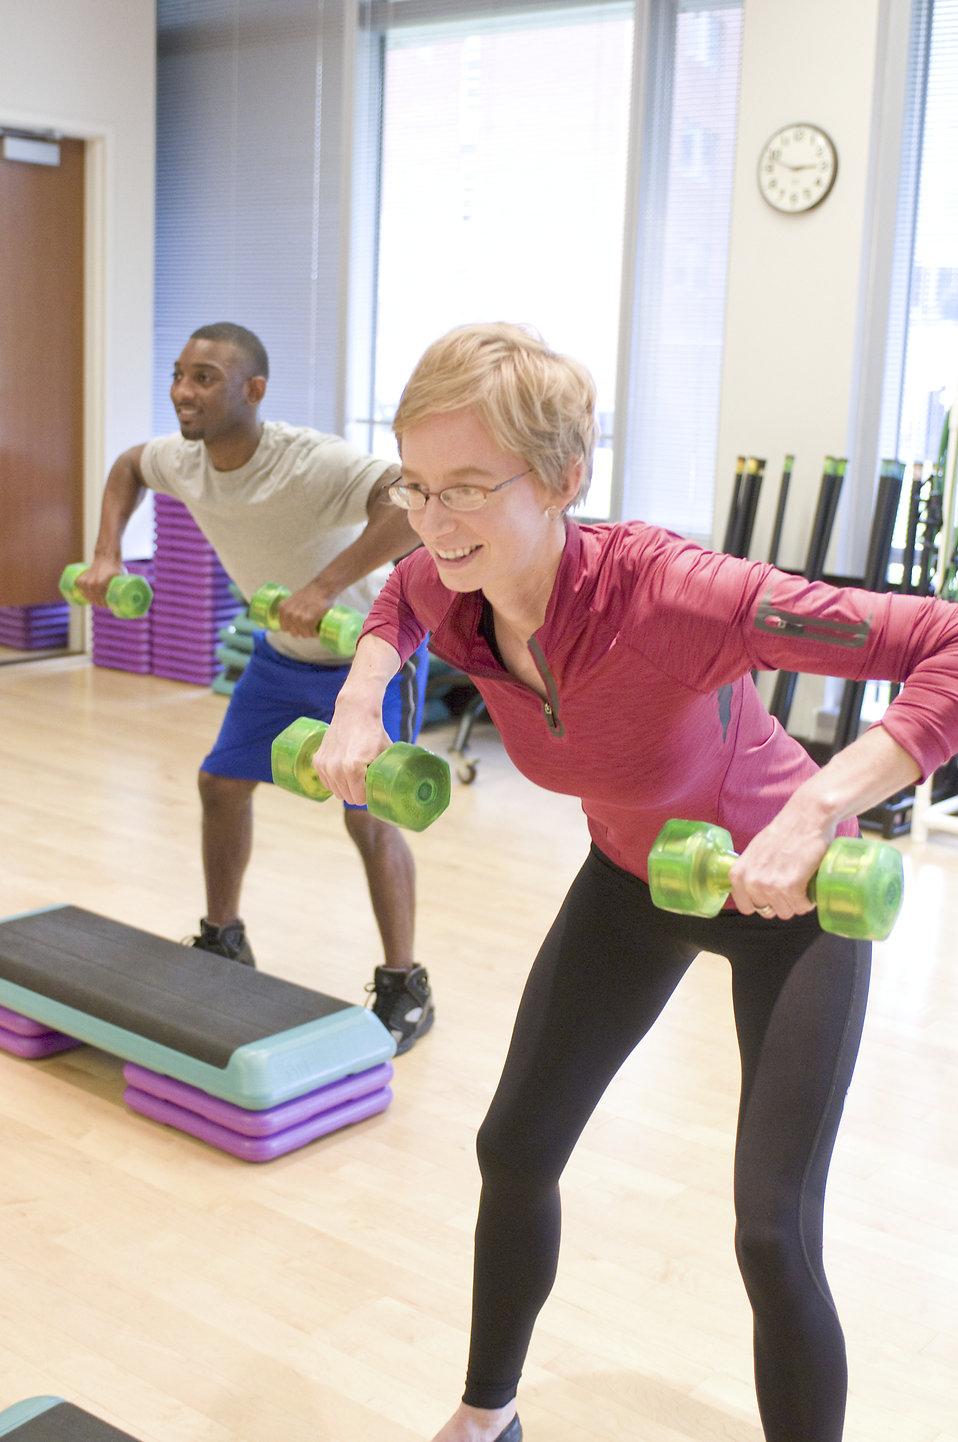 Men and women performing aerobic exercises : Free Stock Photo